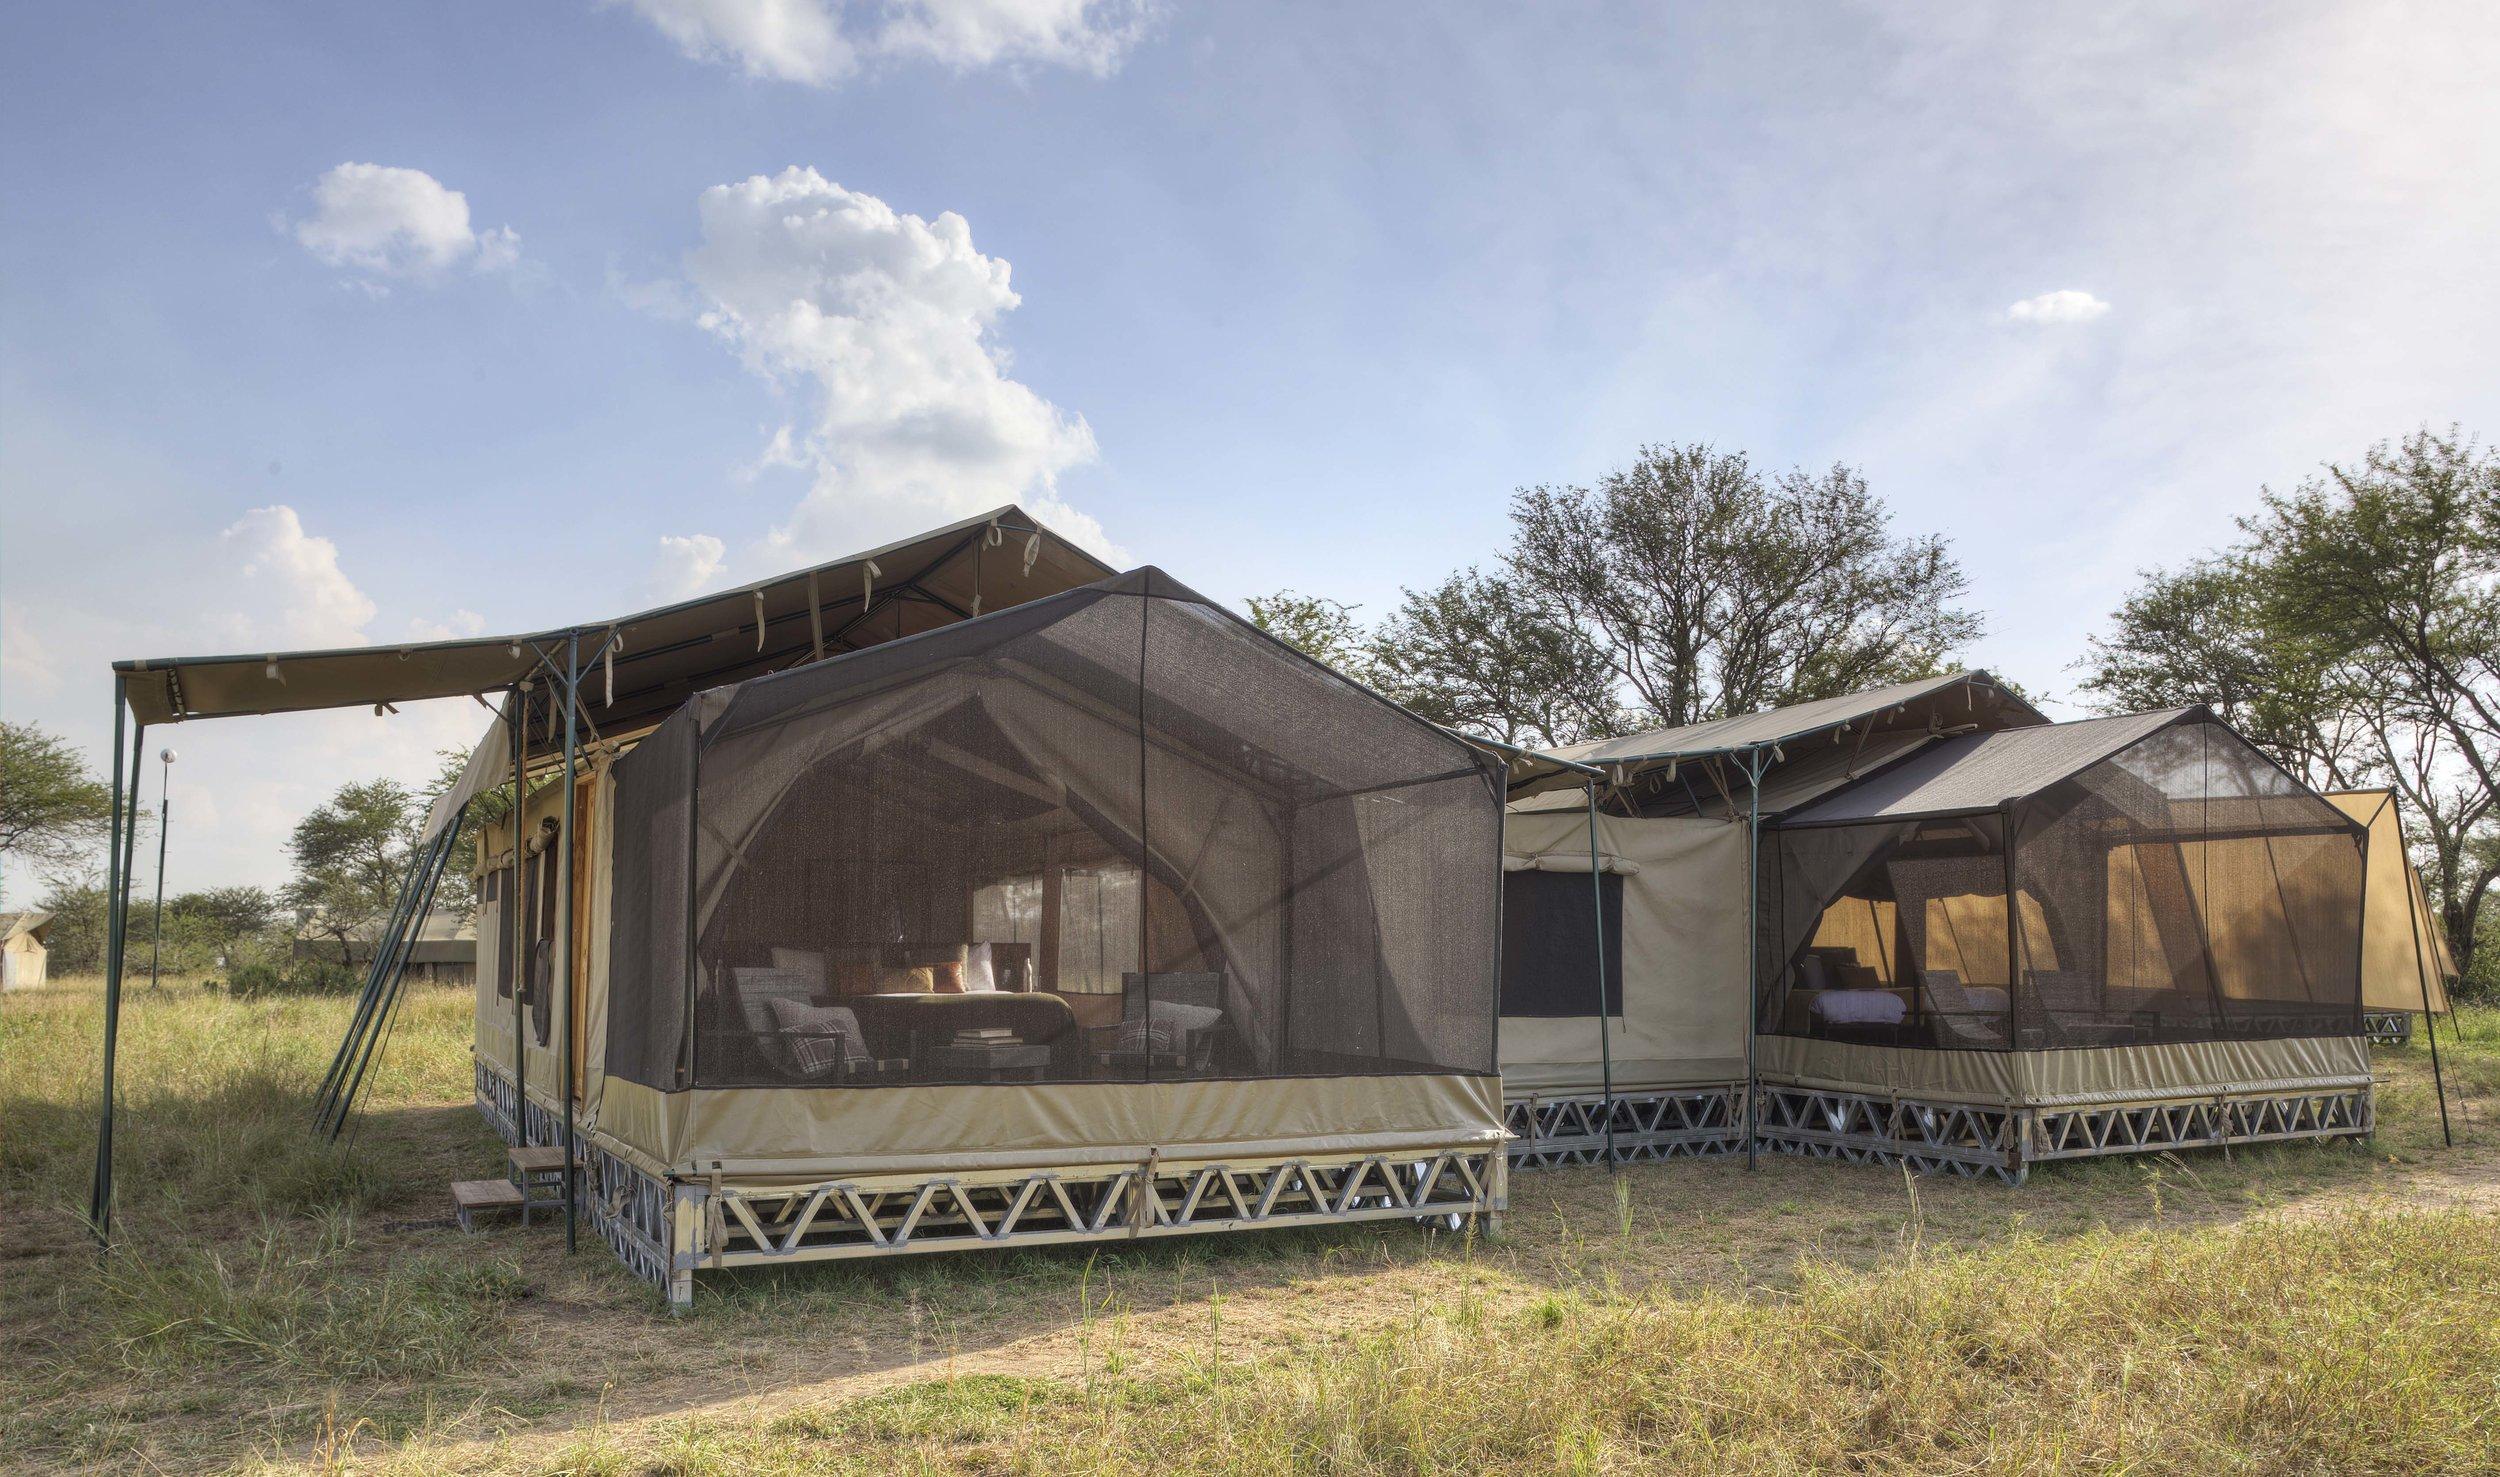 Olakira-Family-tent-star-gazing-tents.jpg